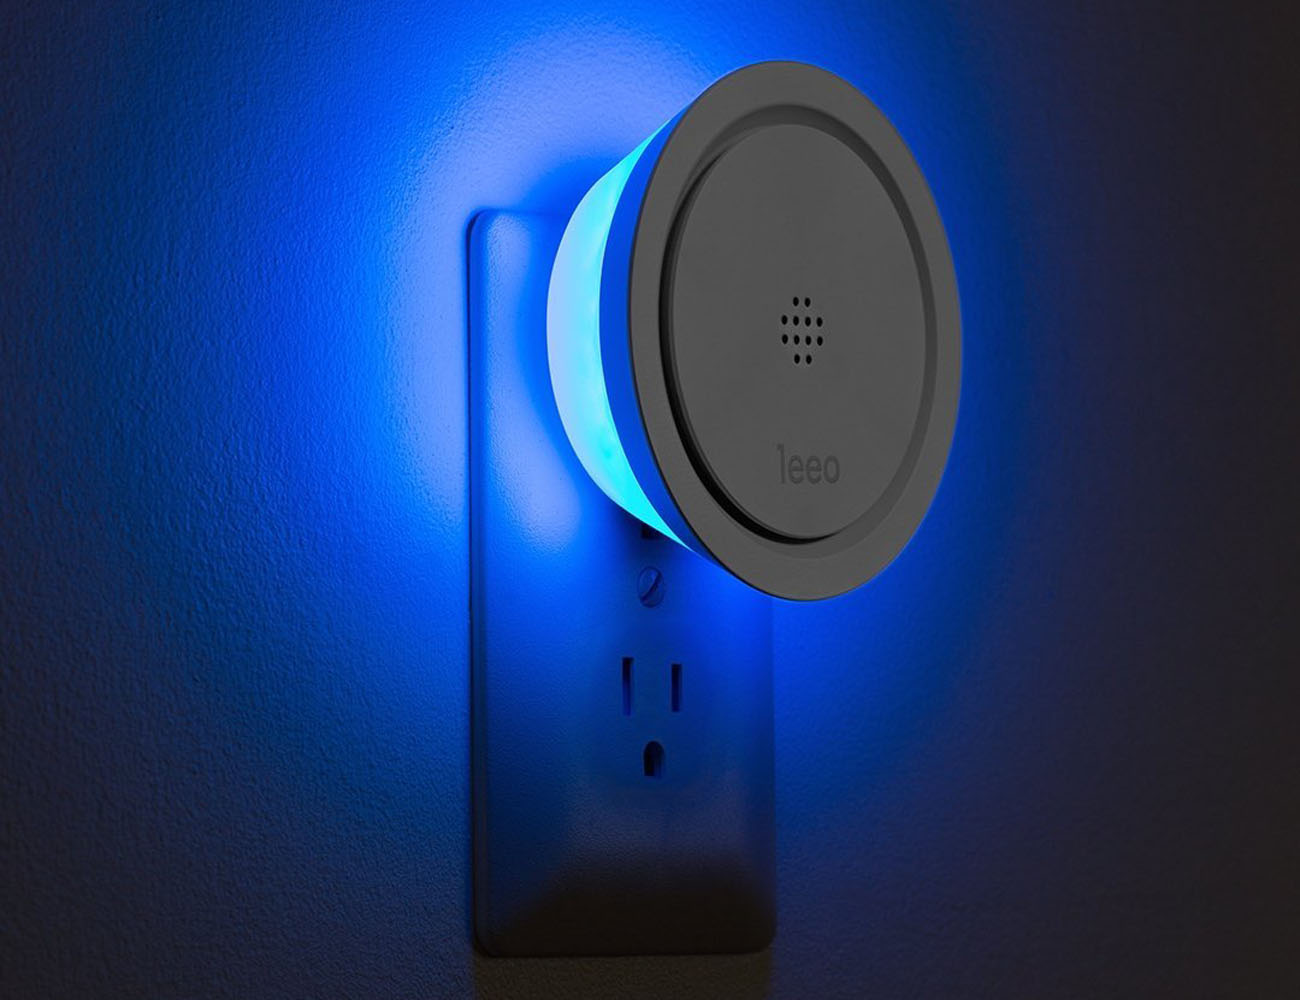 Leeo Smart Alert Safety Nightlight